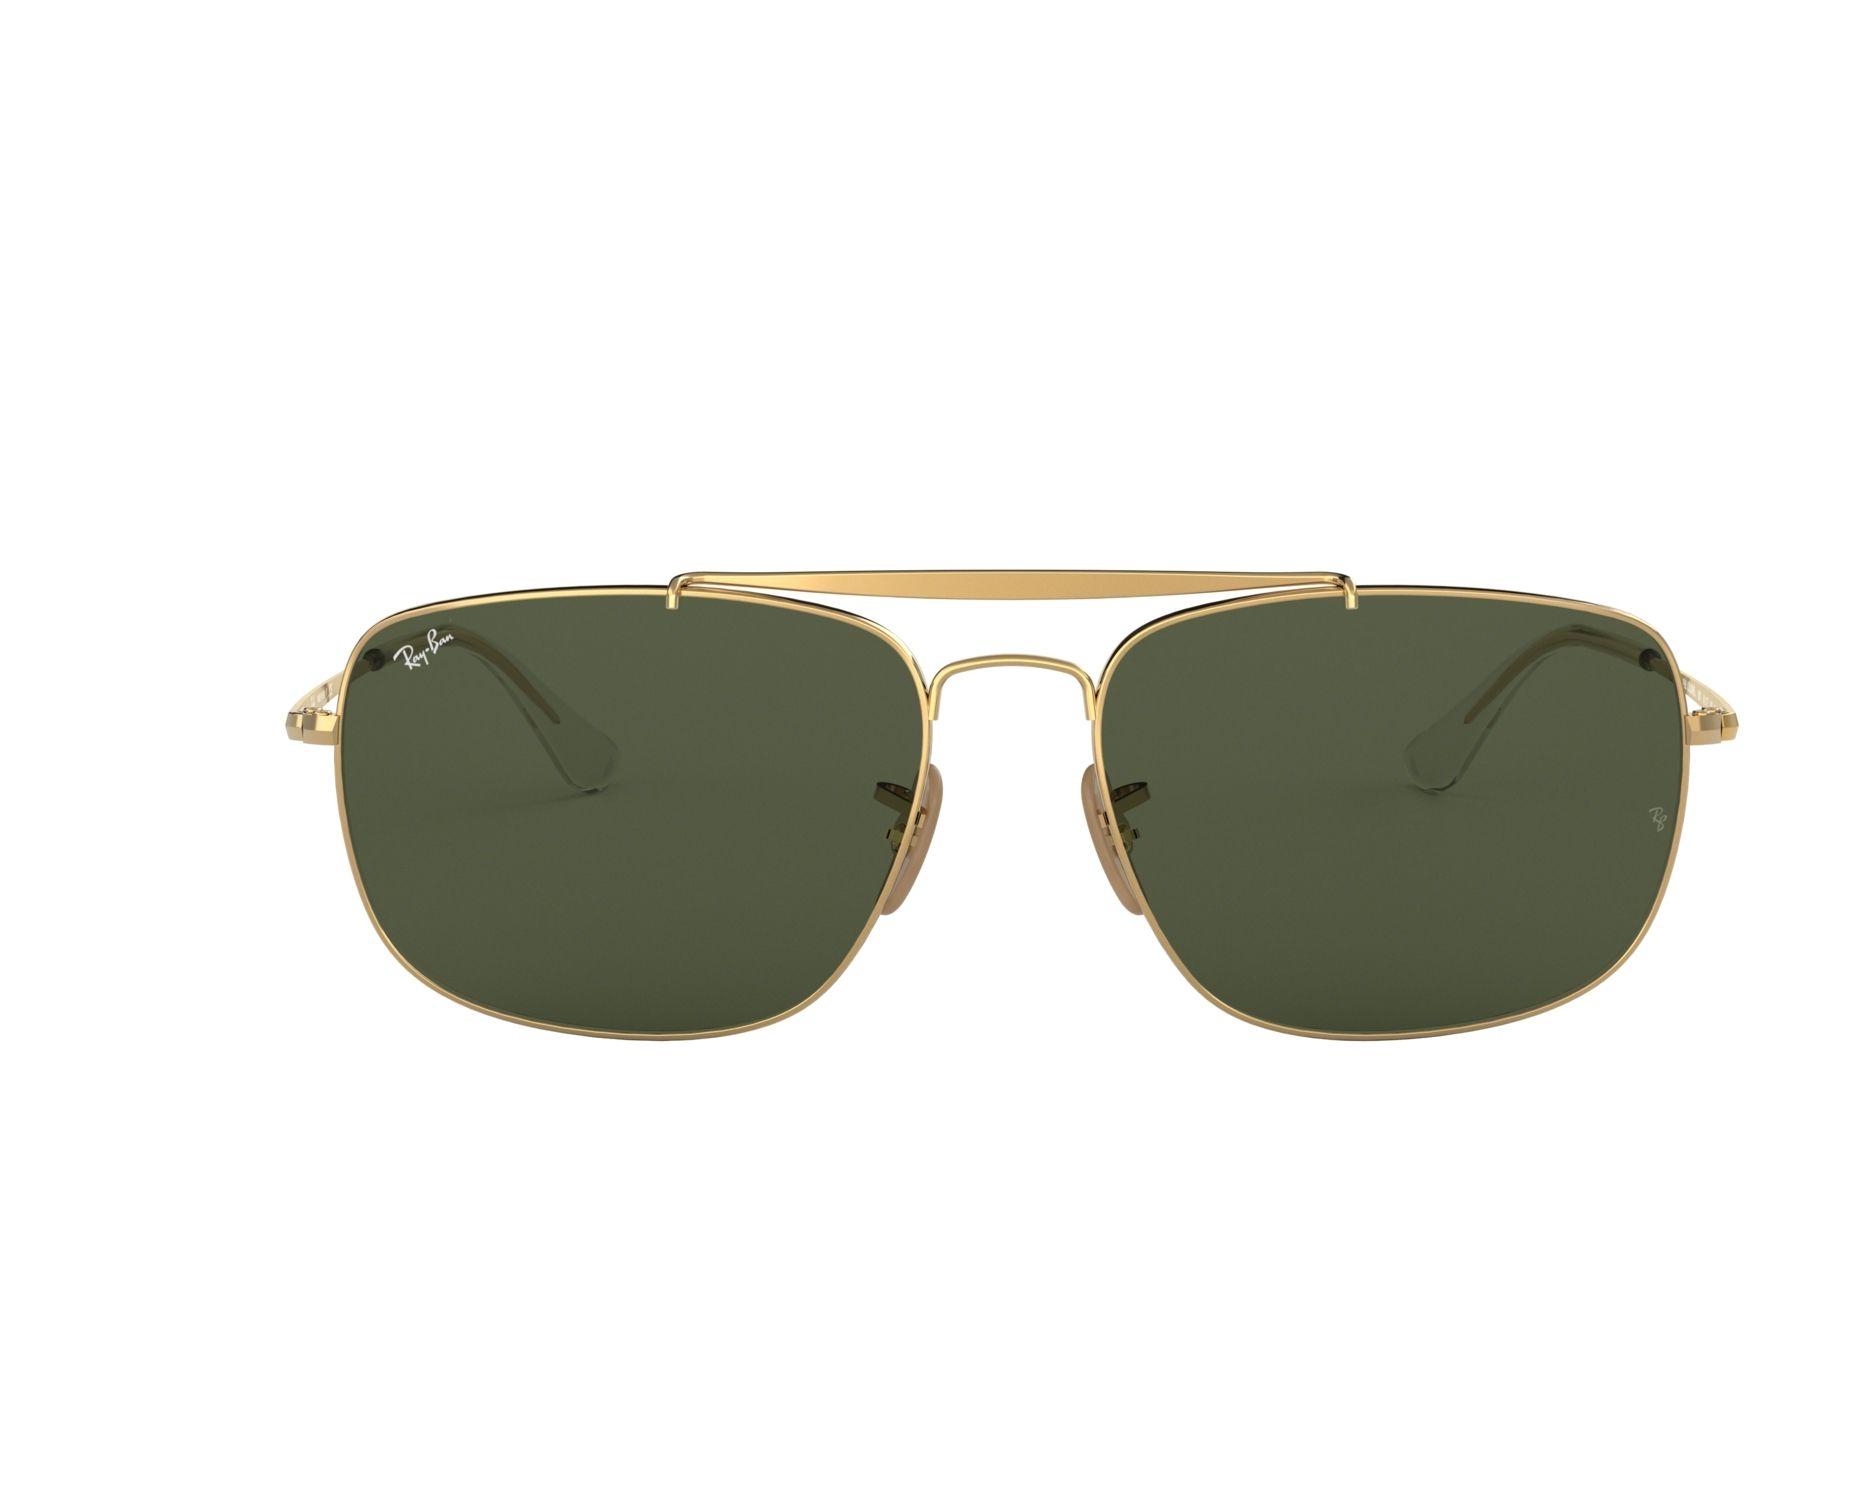 Ray-Ban Sonnenbrille RB-3560 001 gold - Gläser: brau-grün - Visionet